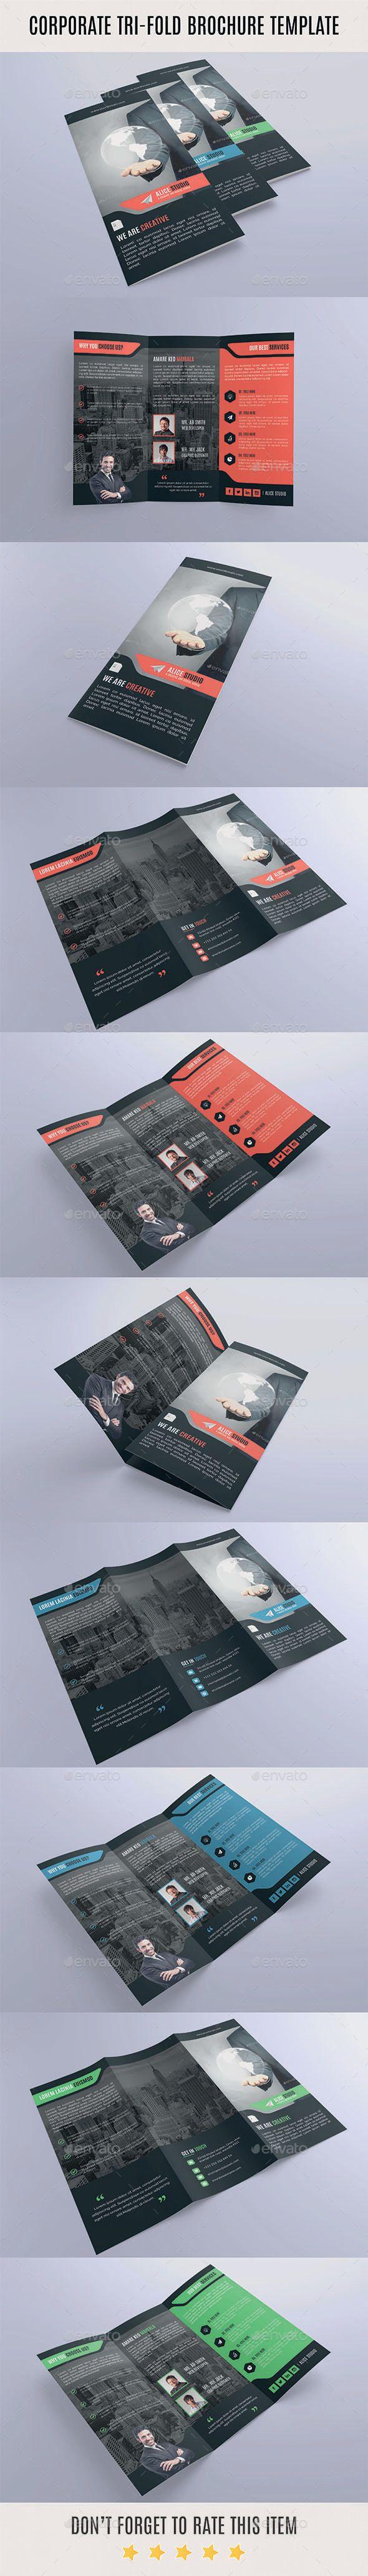 Corporate Tri-Fold Brochure Template Vector EPS, AI #design Download: http://graphicriver.net/item/corporate-trifold-brochure-template/14165362?ref=ksioks